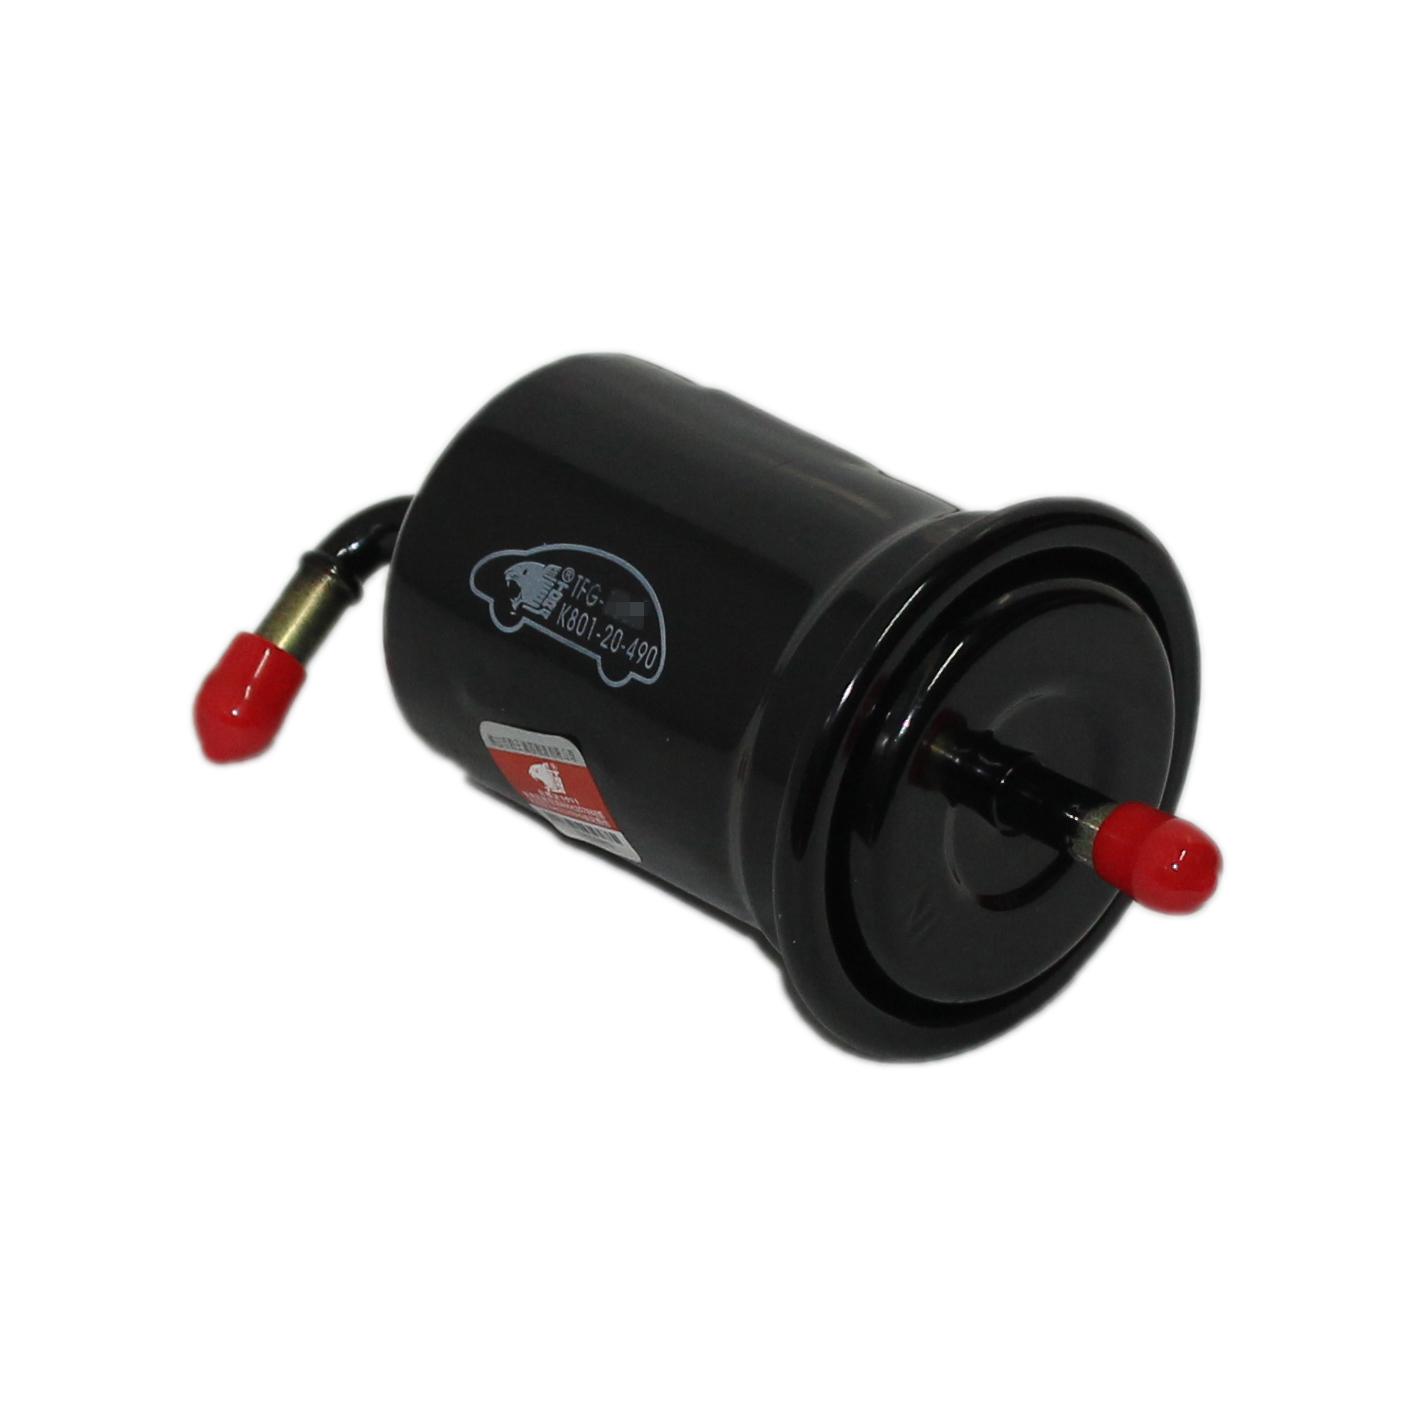 hight resolution of get quotations baowang gasoline fuel filter cartridge gas filter grid mazda charade triplex efi 626gd fukuda mengpaike